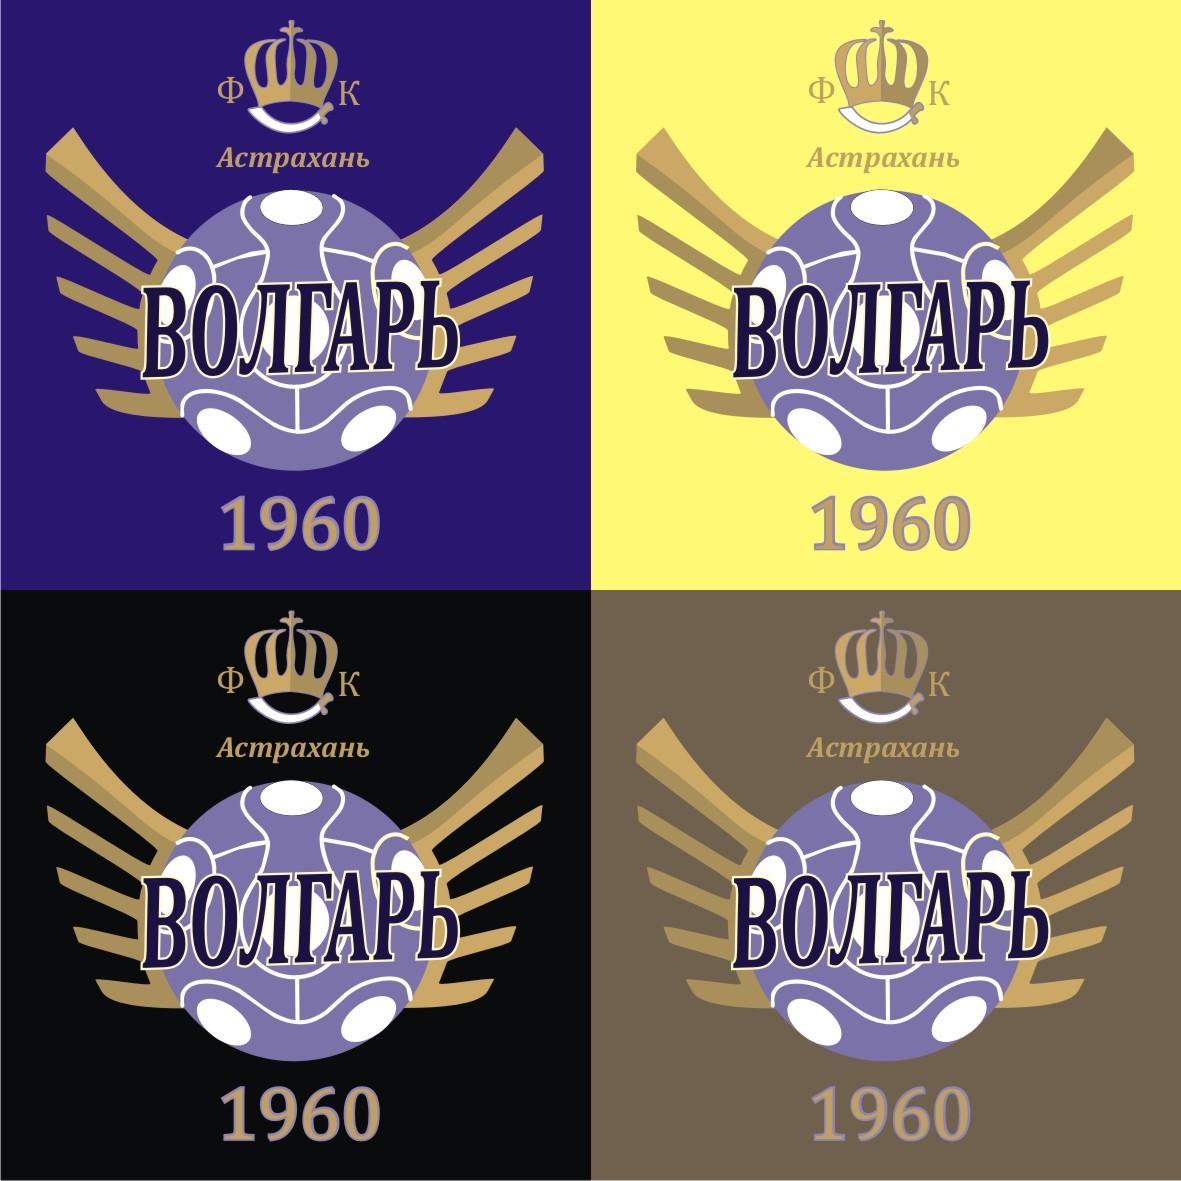 Разработка эмблемы футбольного клуба фото f_4fbf1ab3b347b.jpg